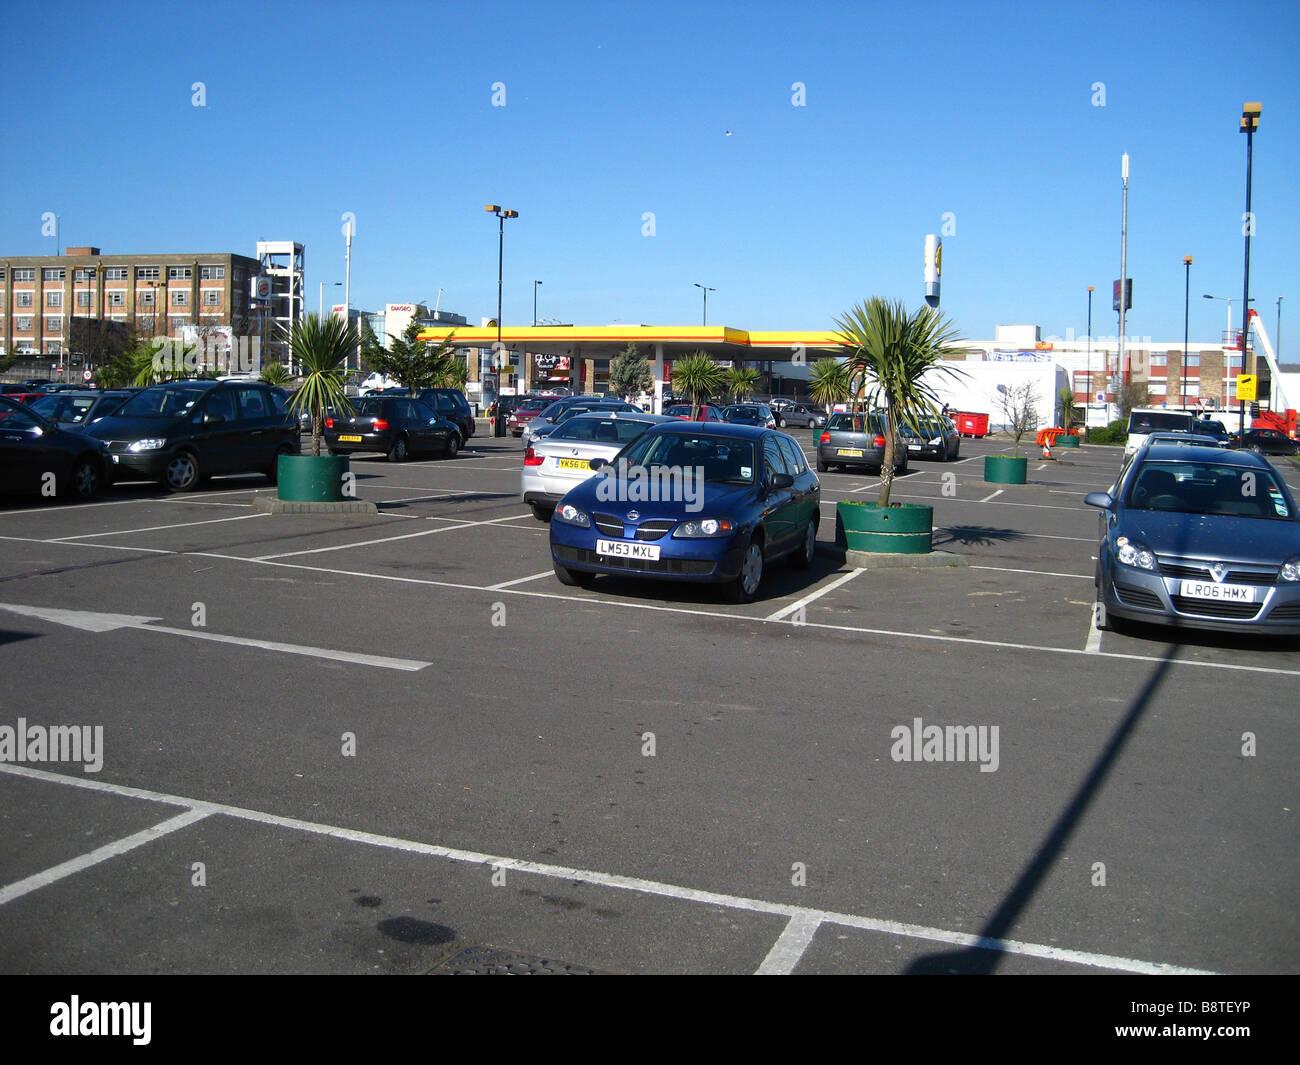 Royal Leisure Car Park At Acton London England Uk Stock